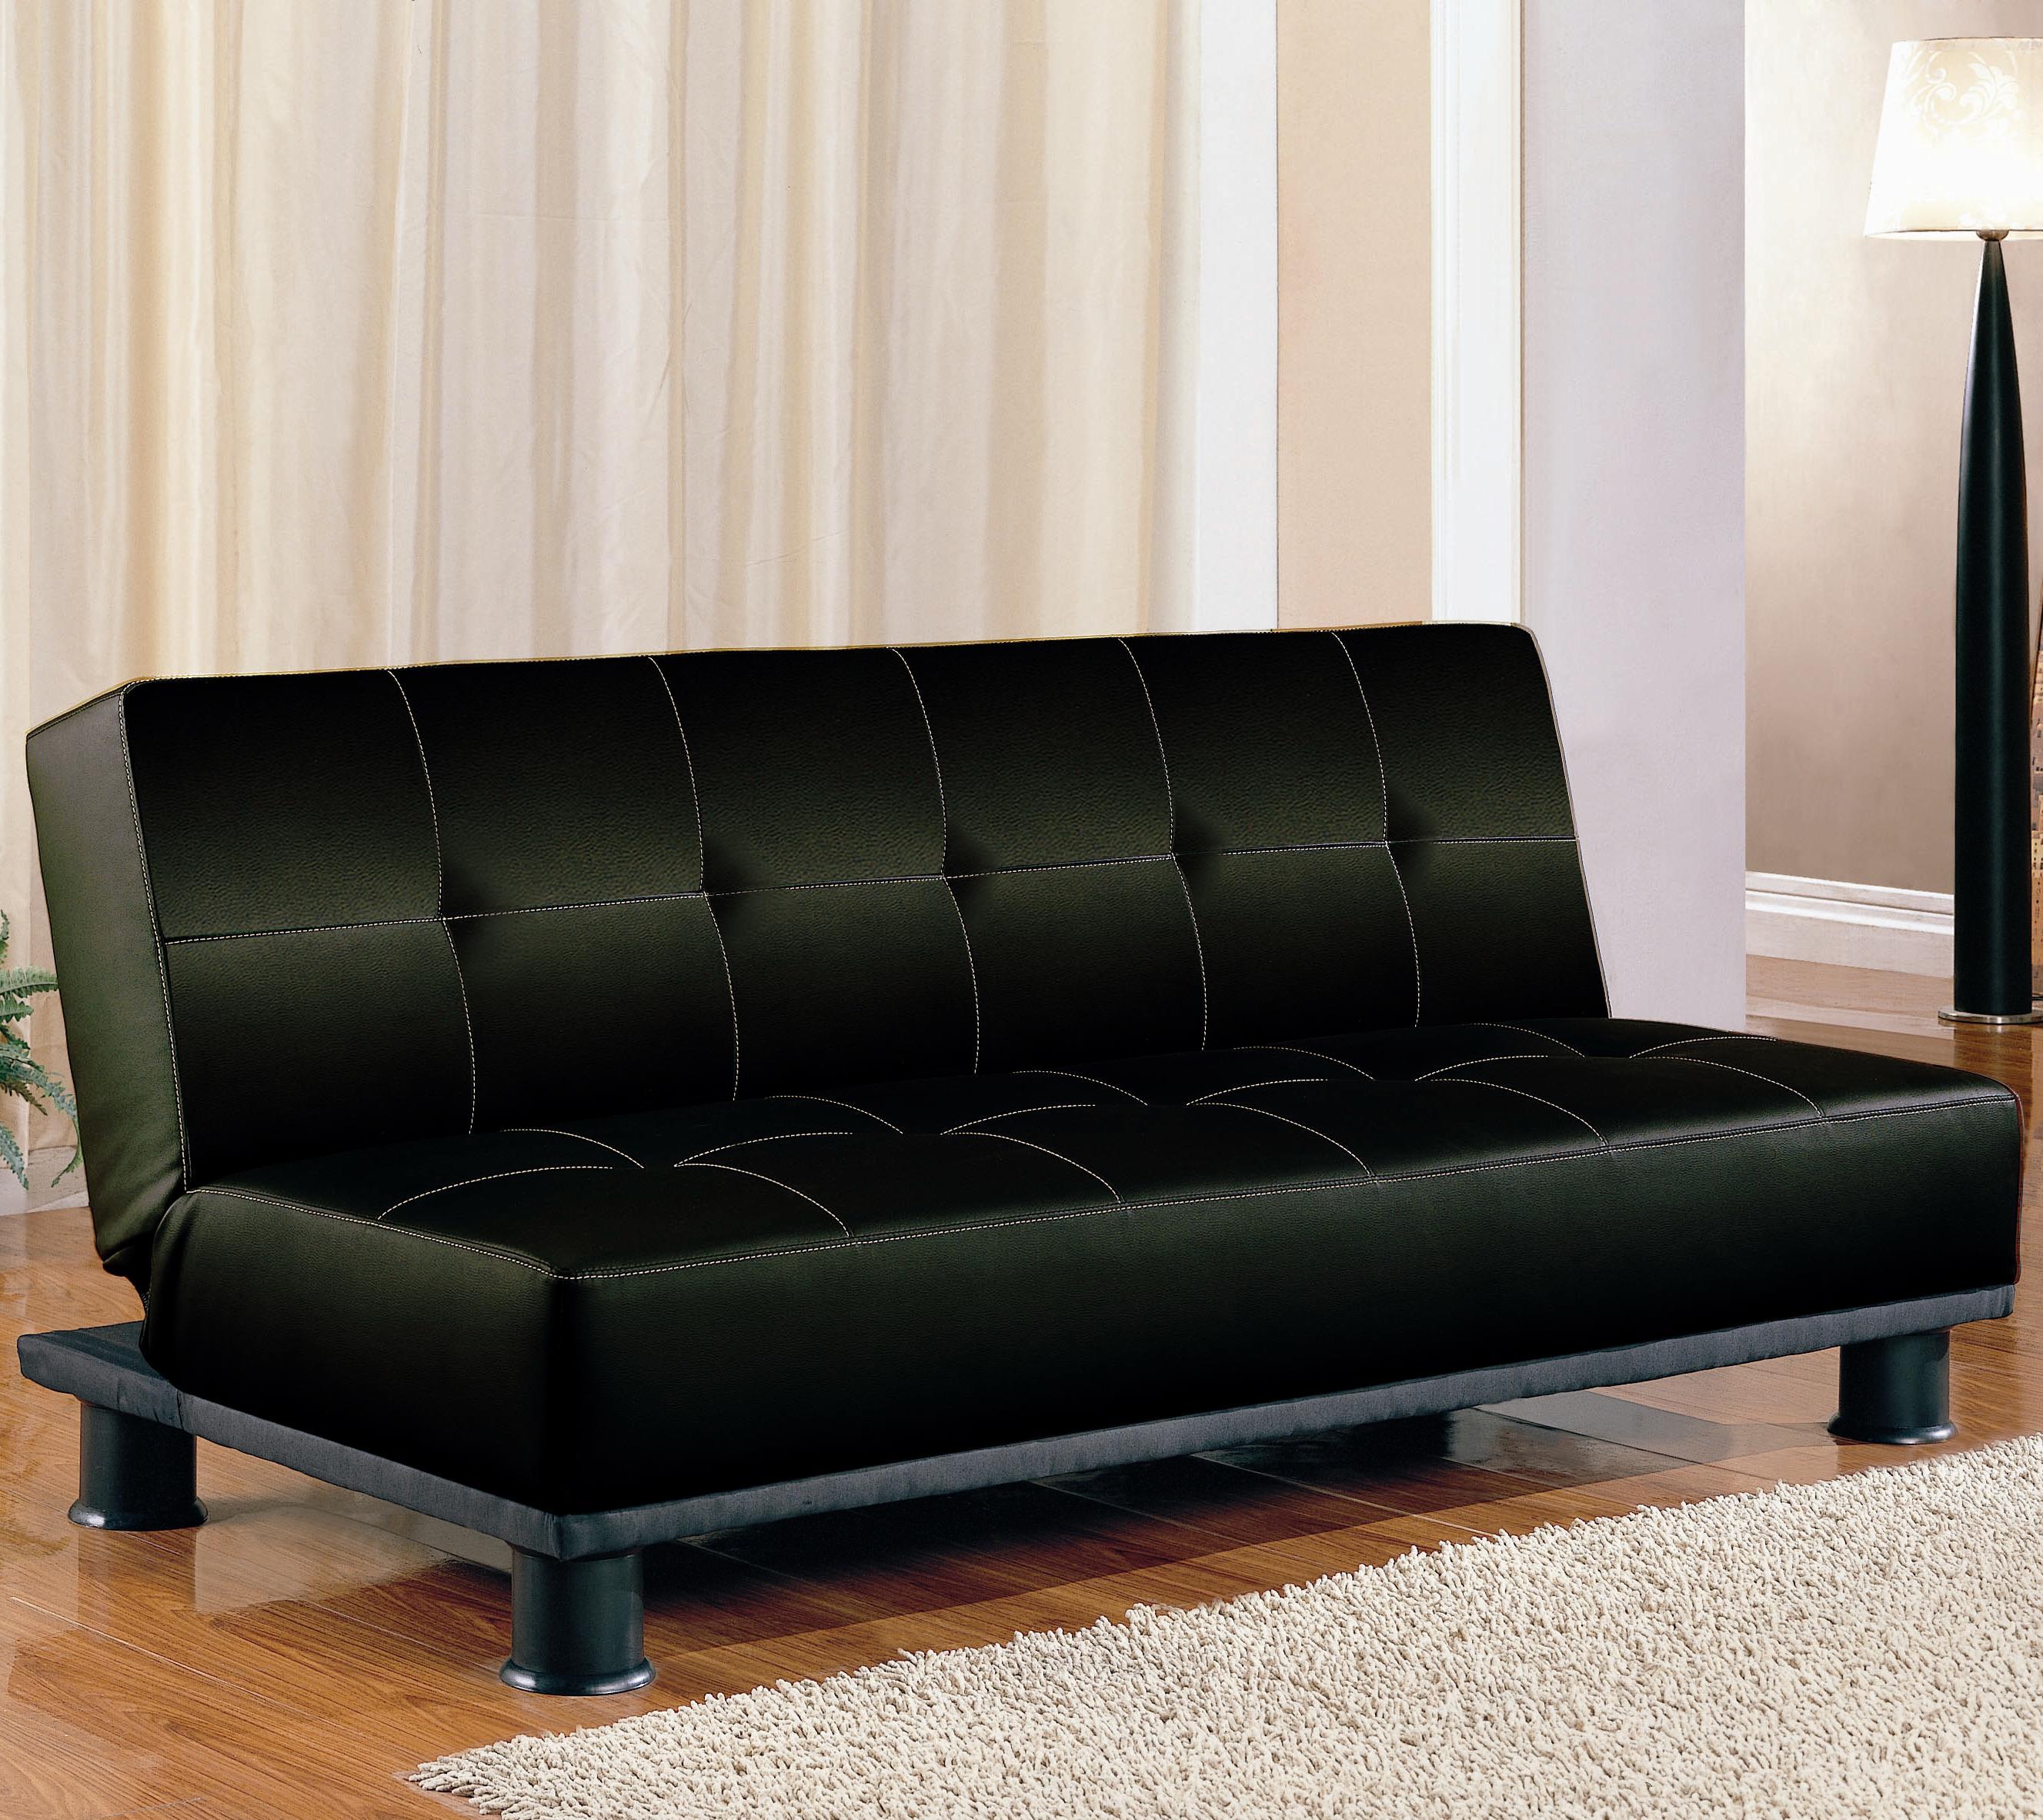 value city furniture sofa bed rattan modular corner set garden coaster beds and futons contemporary armless